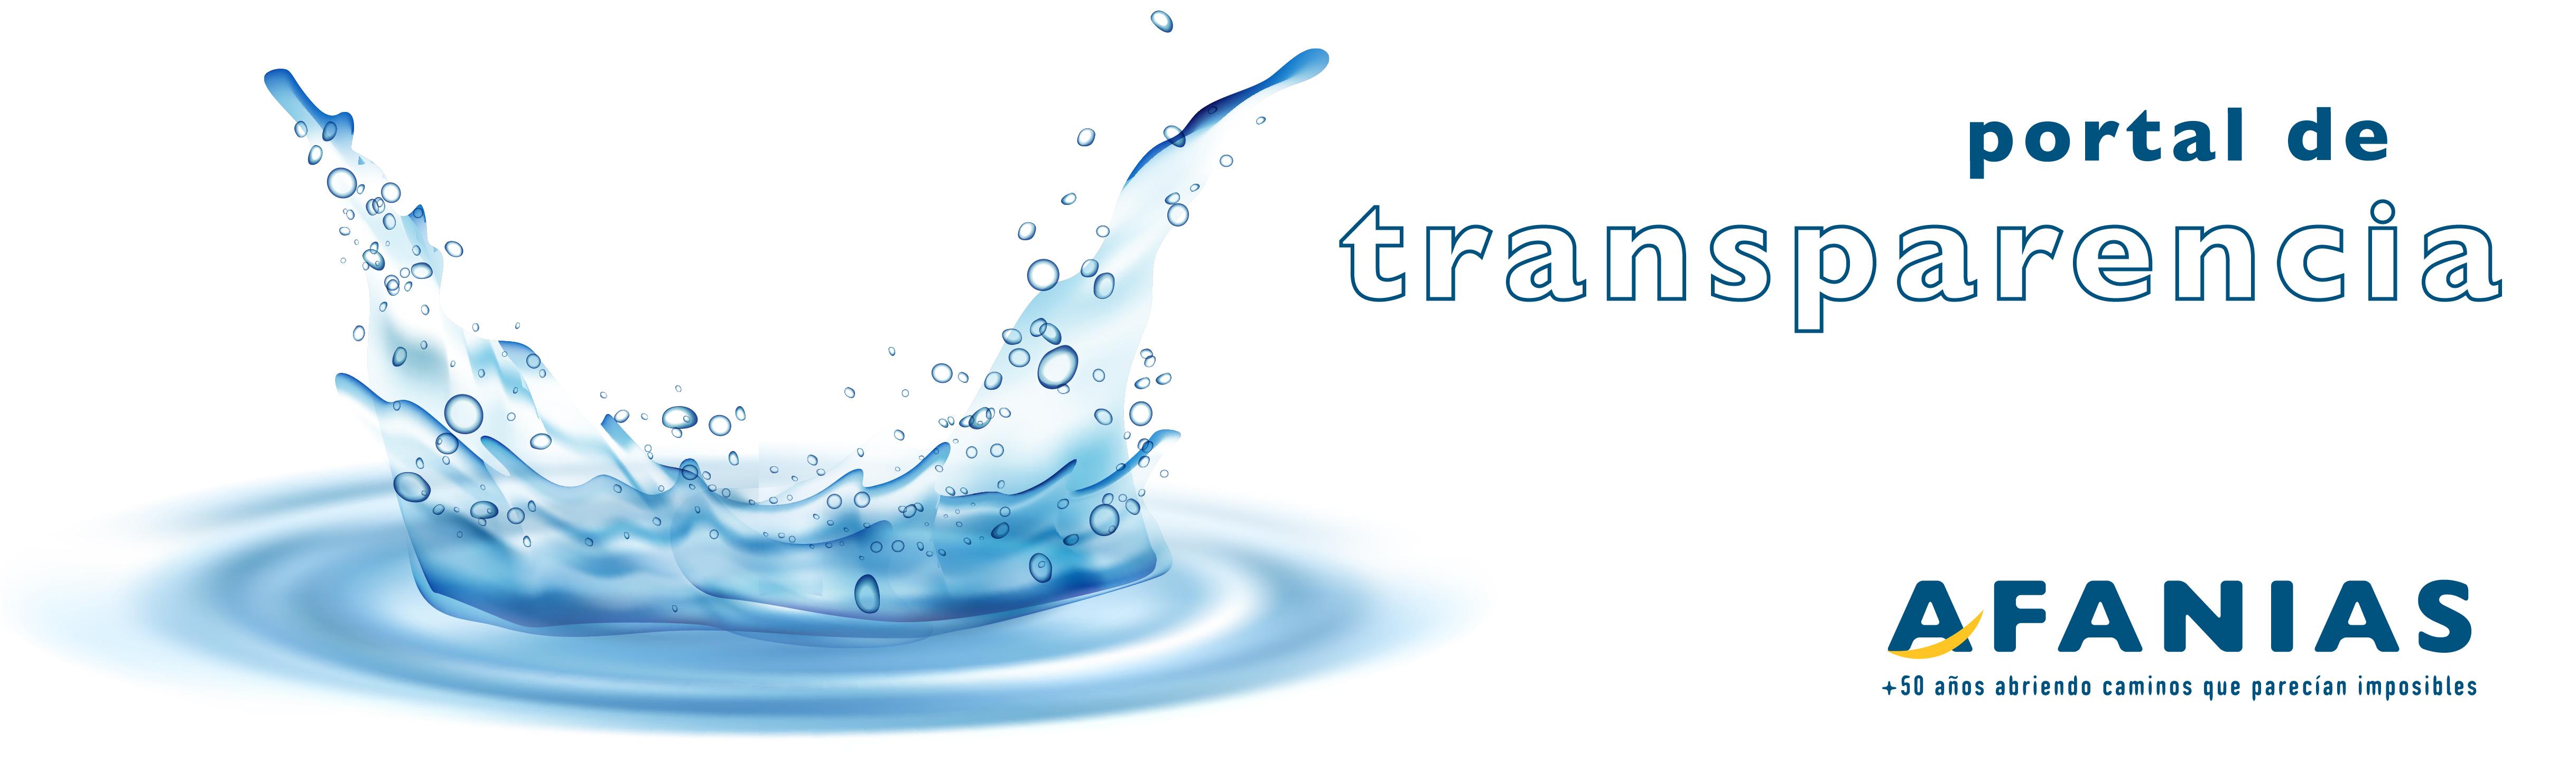 PORTAL-TRANSPARENCIA-01